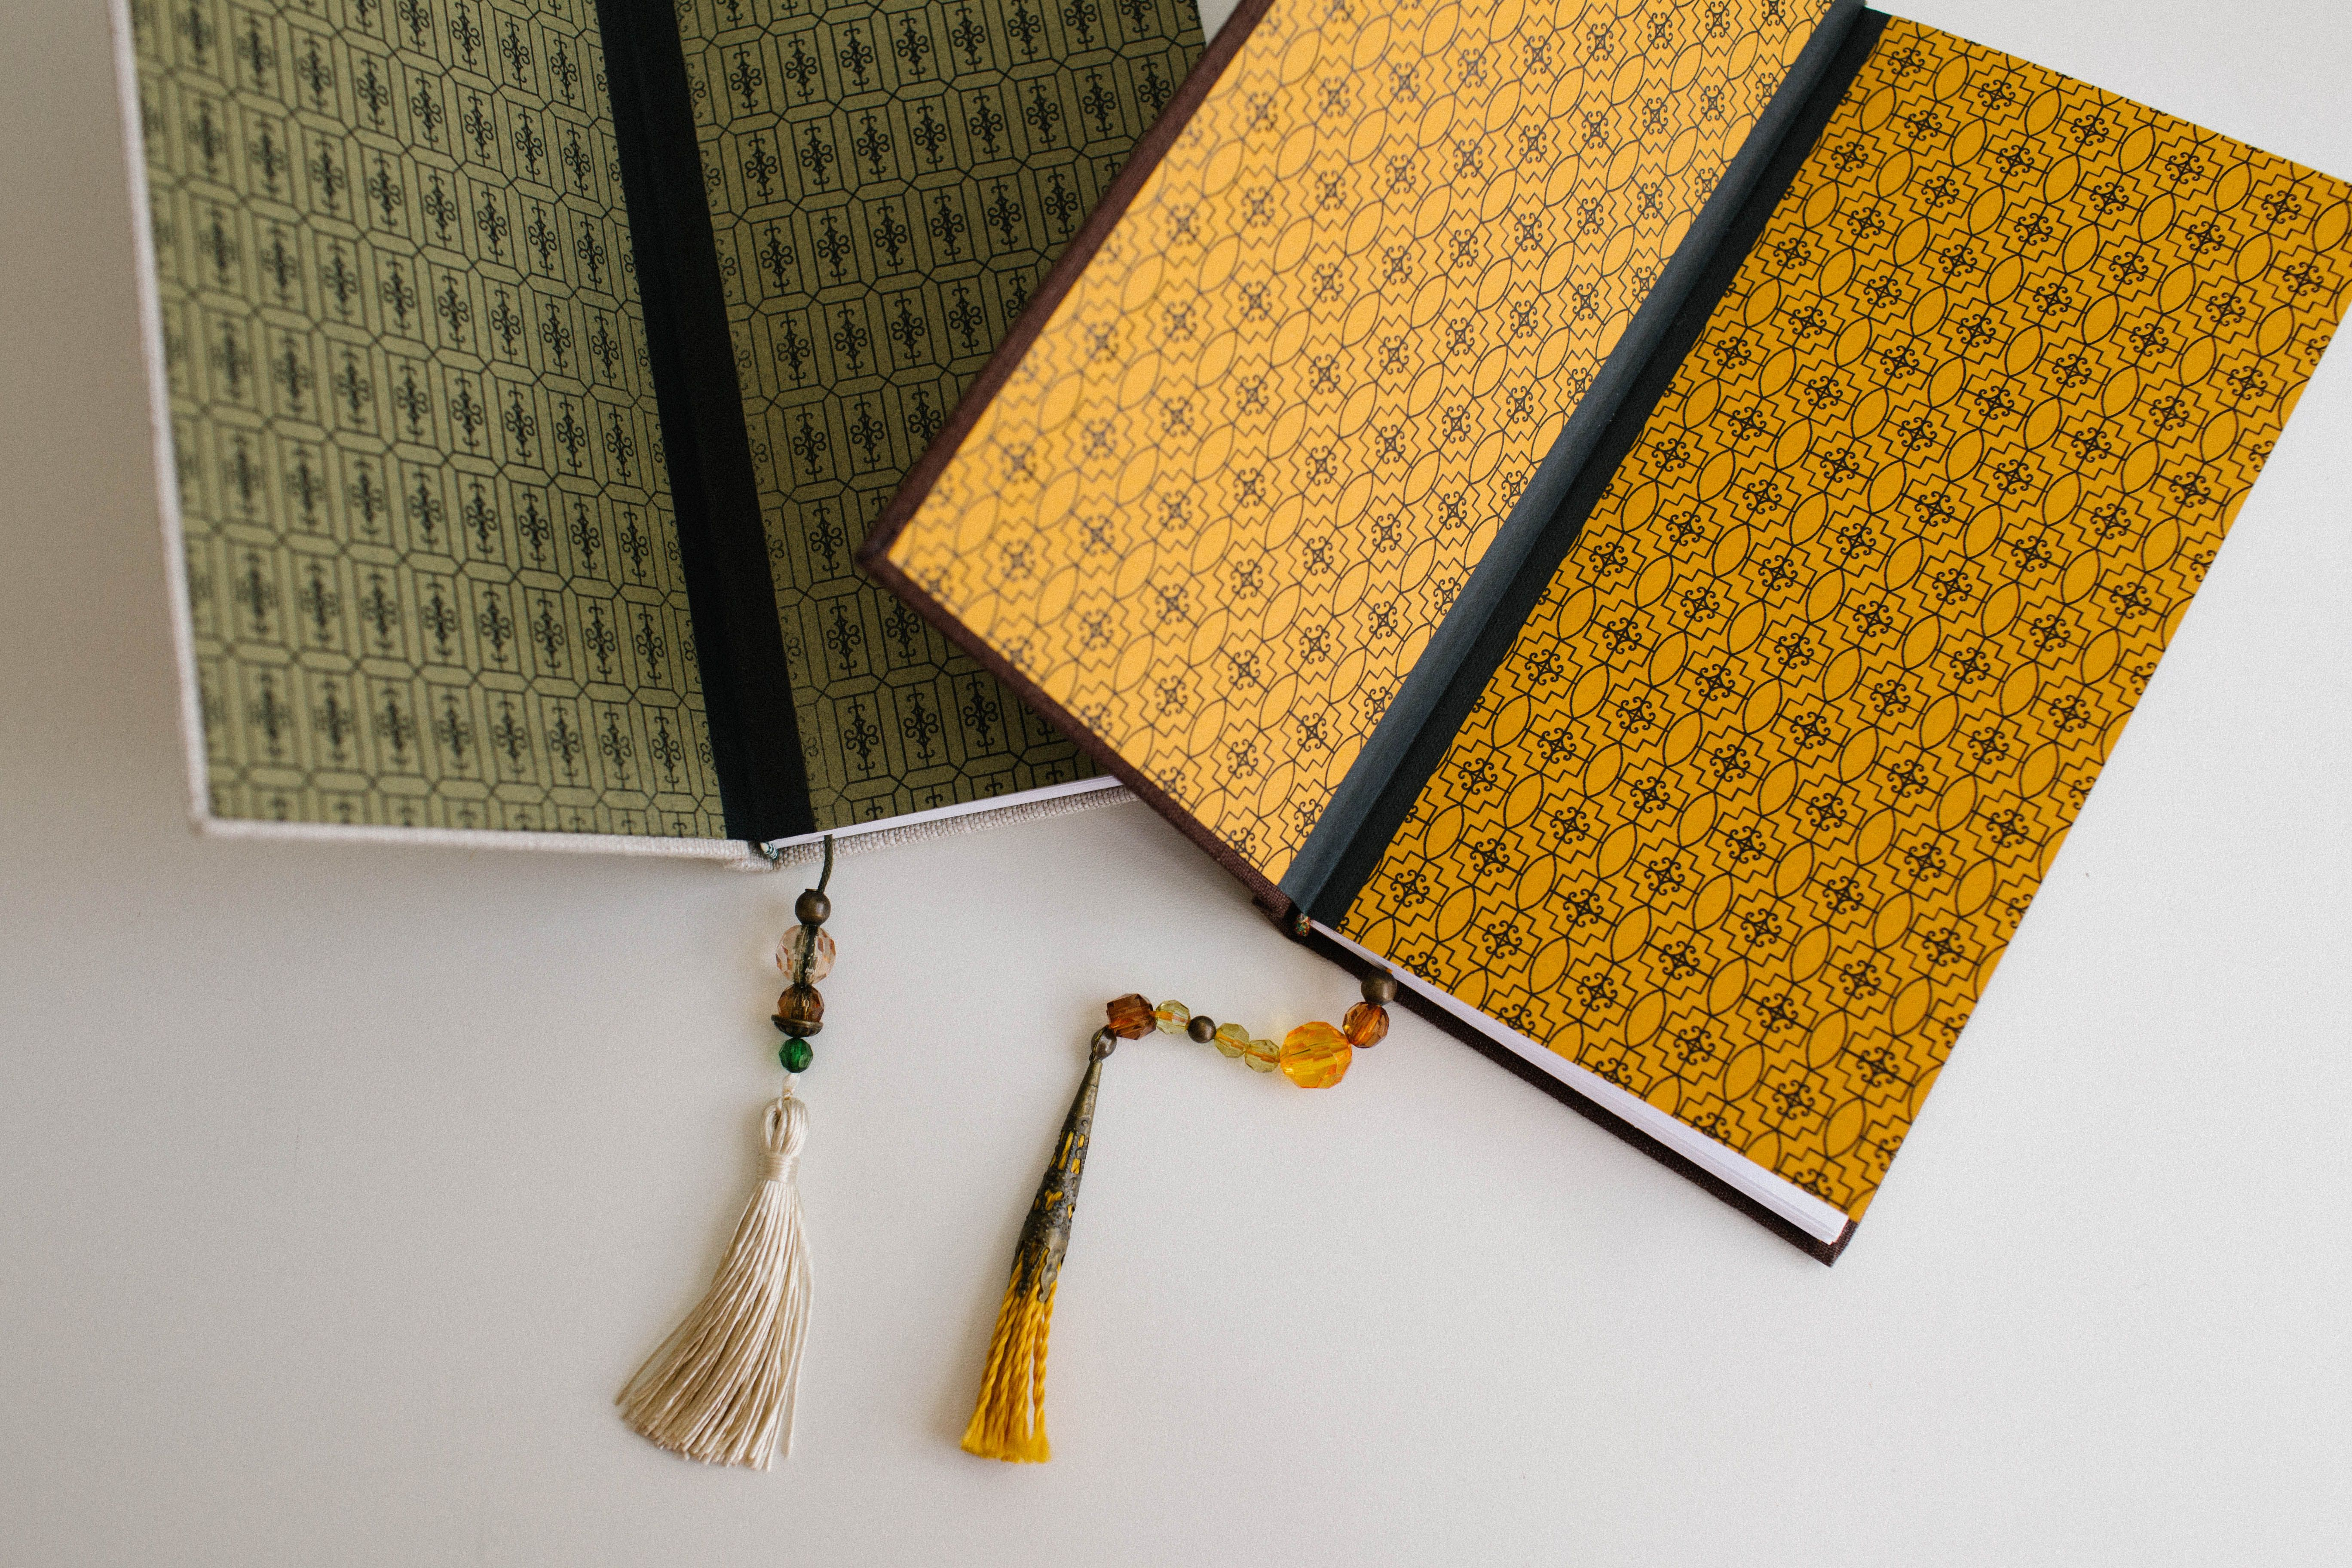 Genoveva Atelier Handmade Books Book Binding Bookbinding